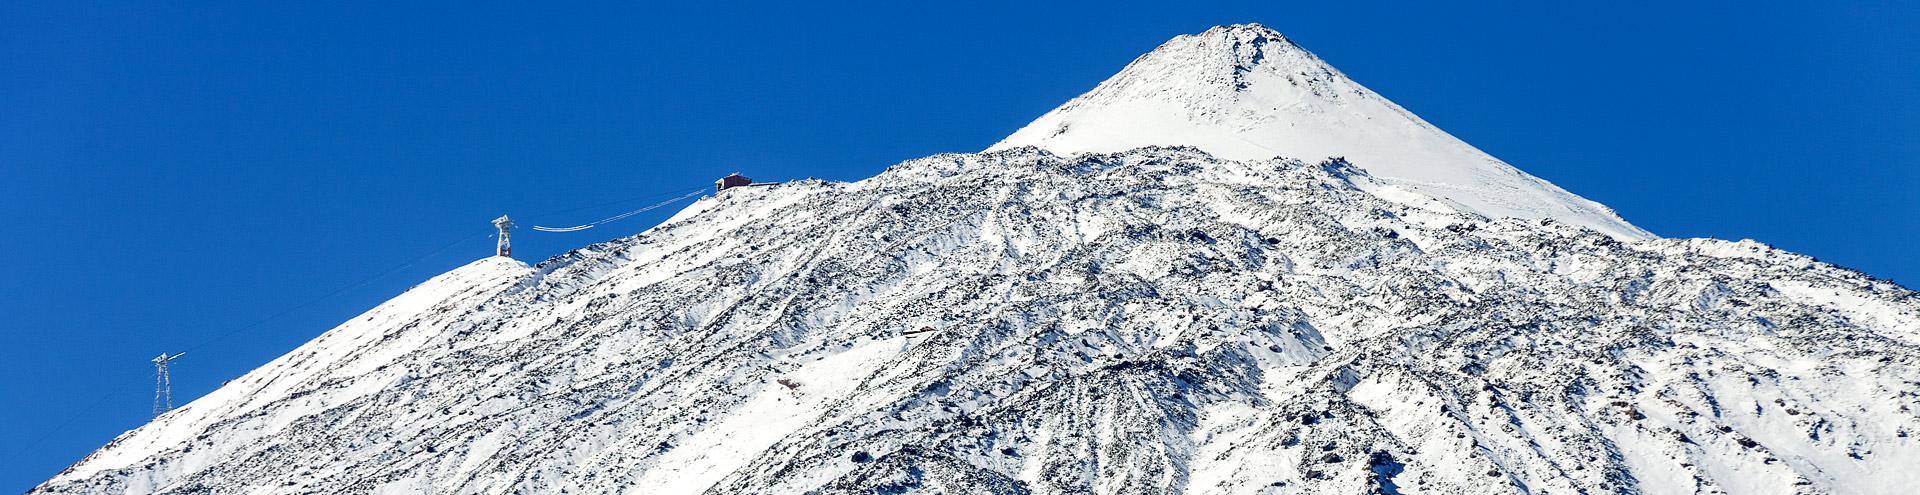 The snow covered Teide volcano on Tenerife